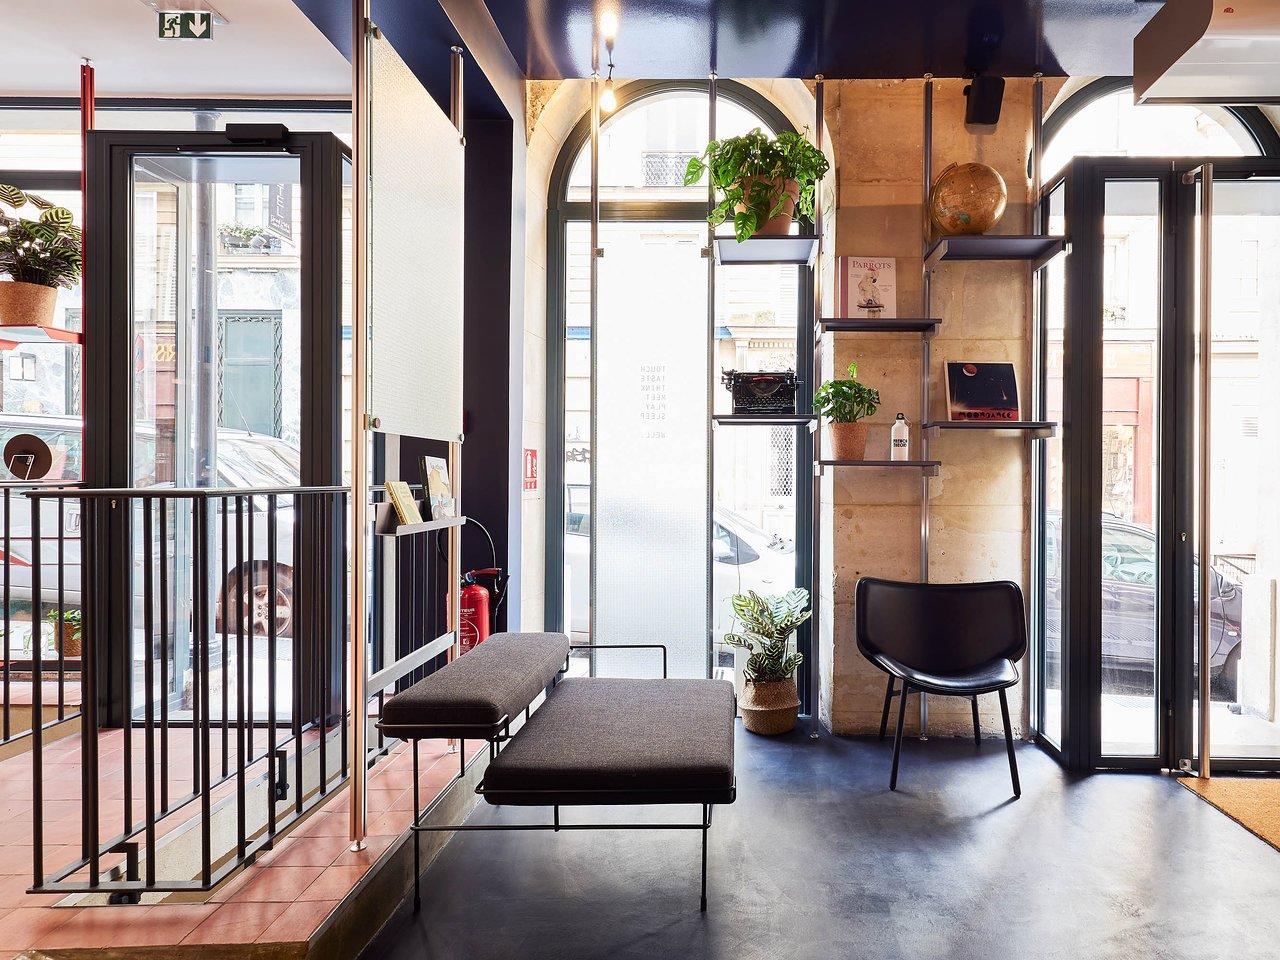 100 Génial Idées Akr French Design Avis